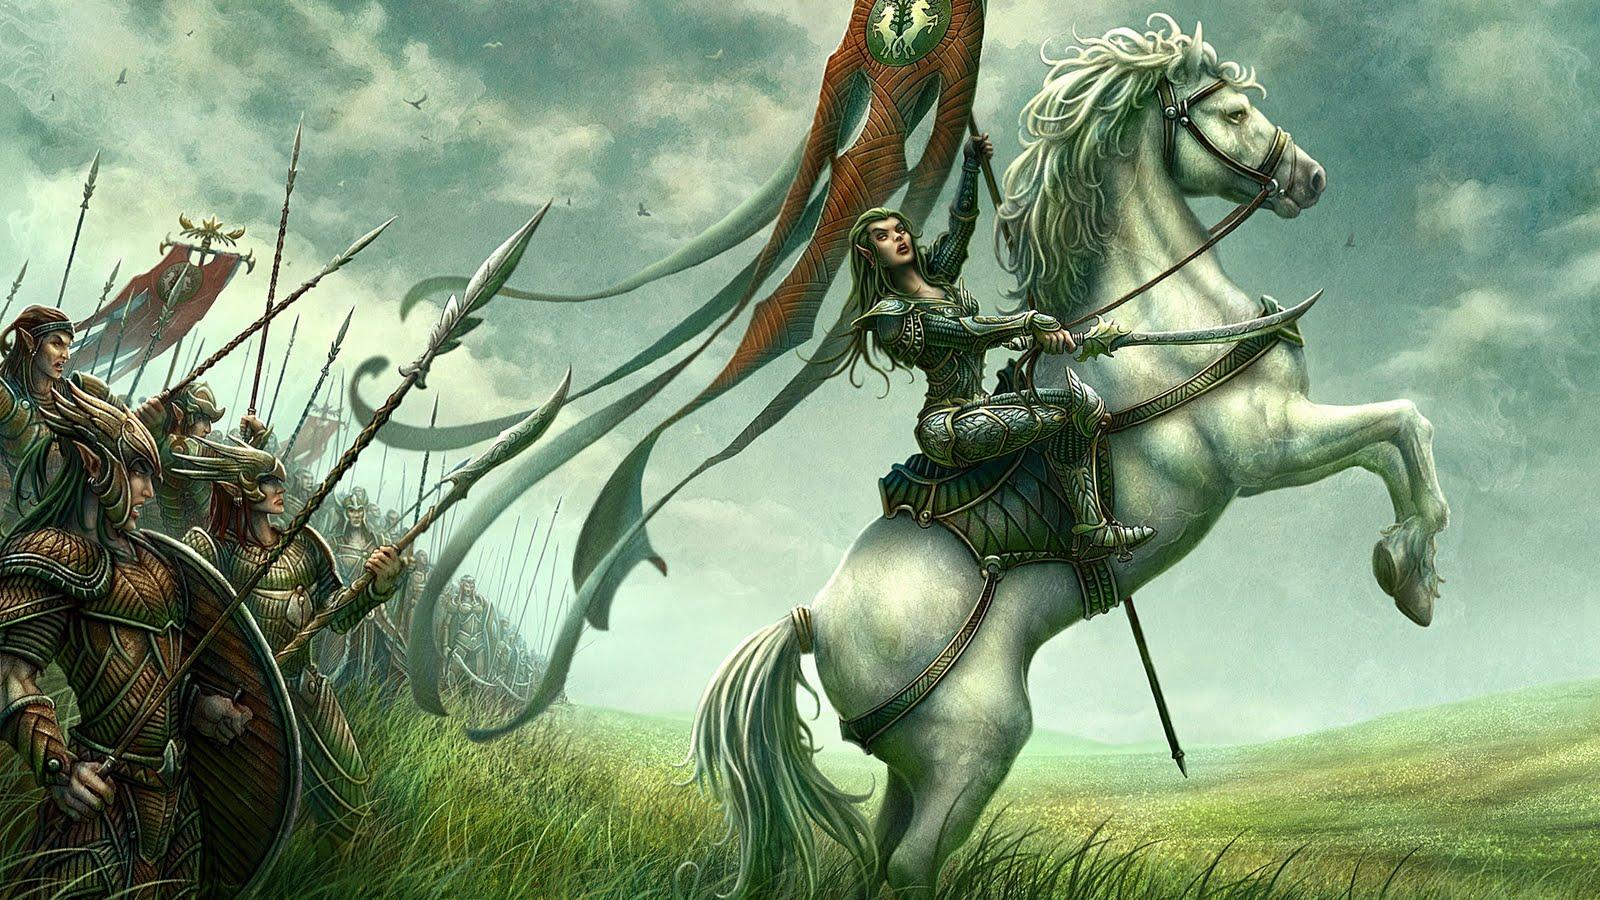 Simple   Wallpaper Horse Warrior - meebomedia  Trends_6178100.jpg